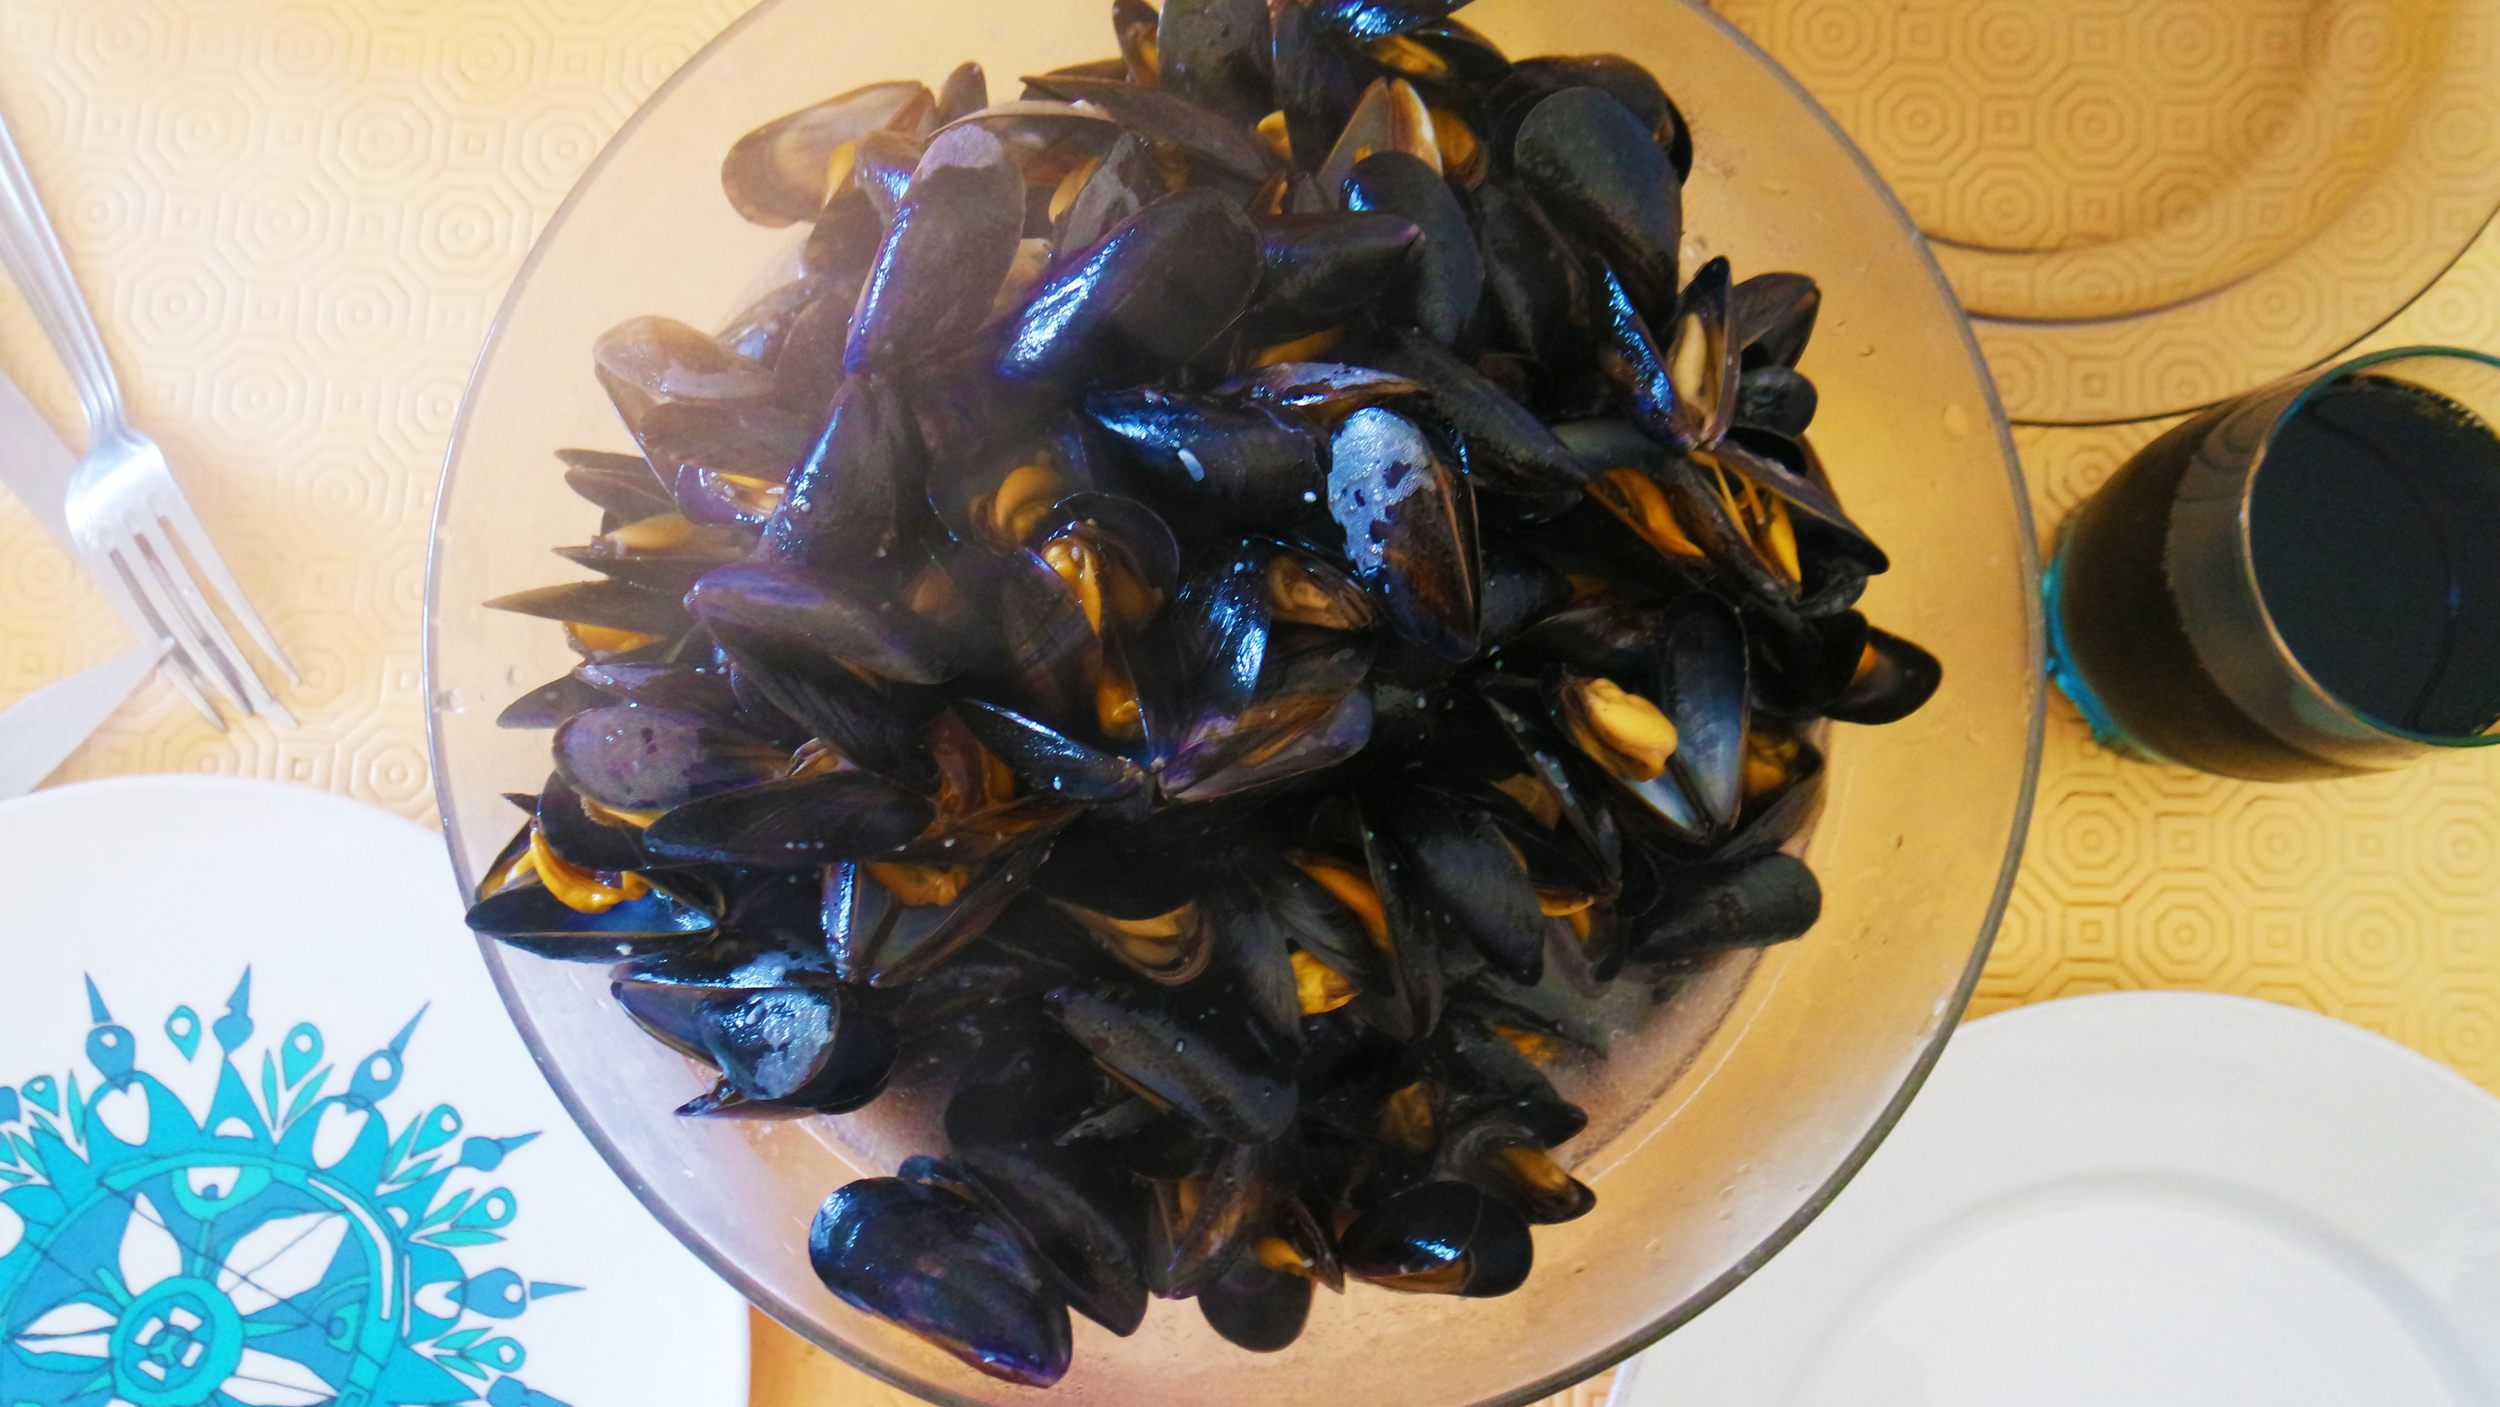 Fresh Mussels for breakfast? YES PLEASE!